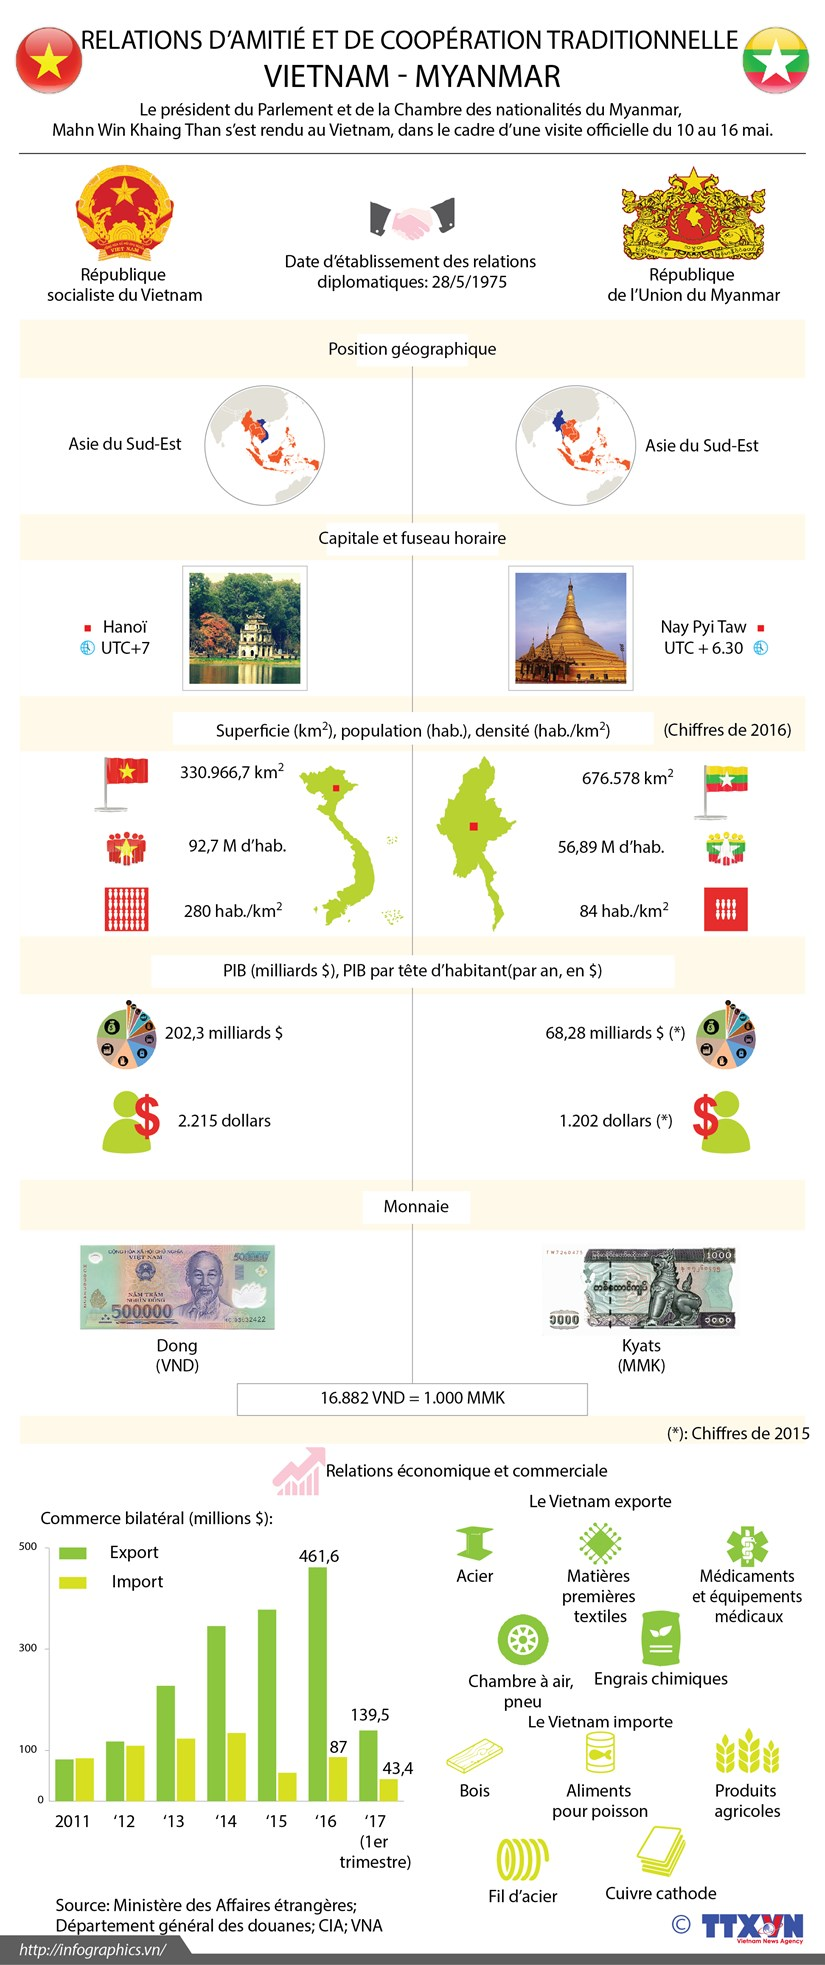 Relations d'amitie et de cooperation traditionnelle Vietnam - Myanmar hinh anh 1